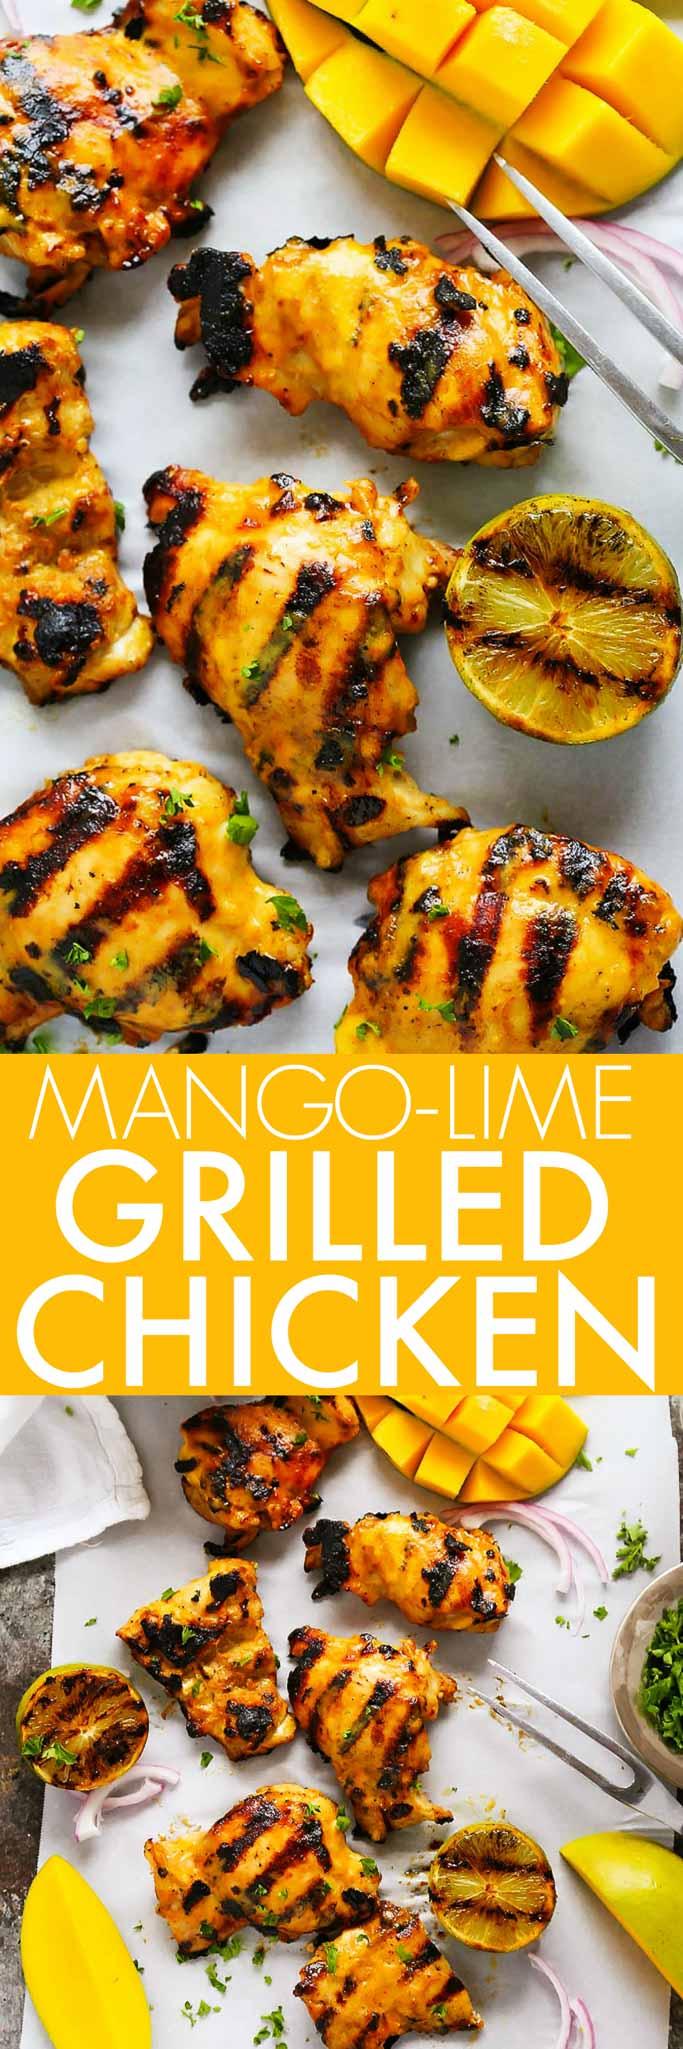 recipe: hot chicken marinade for grilling [22]